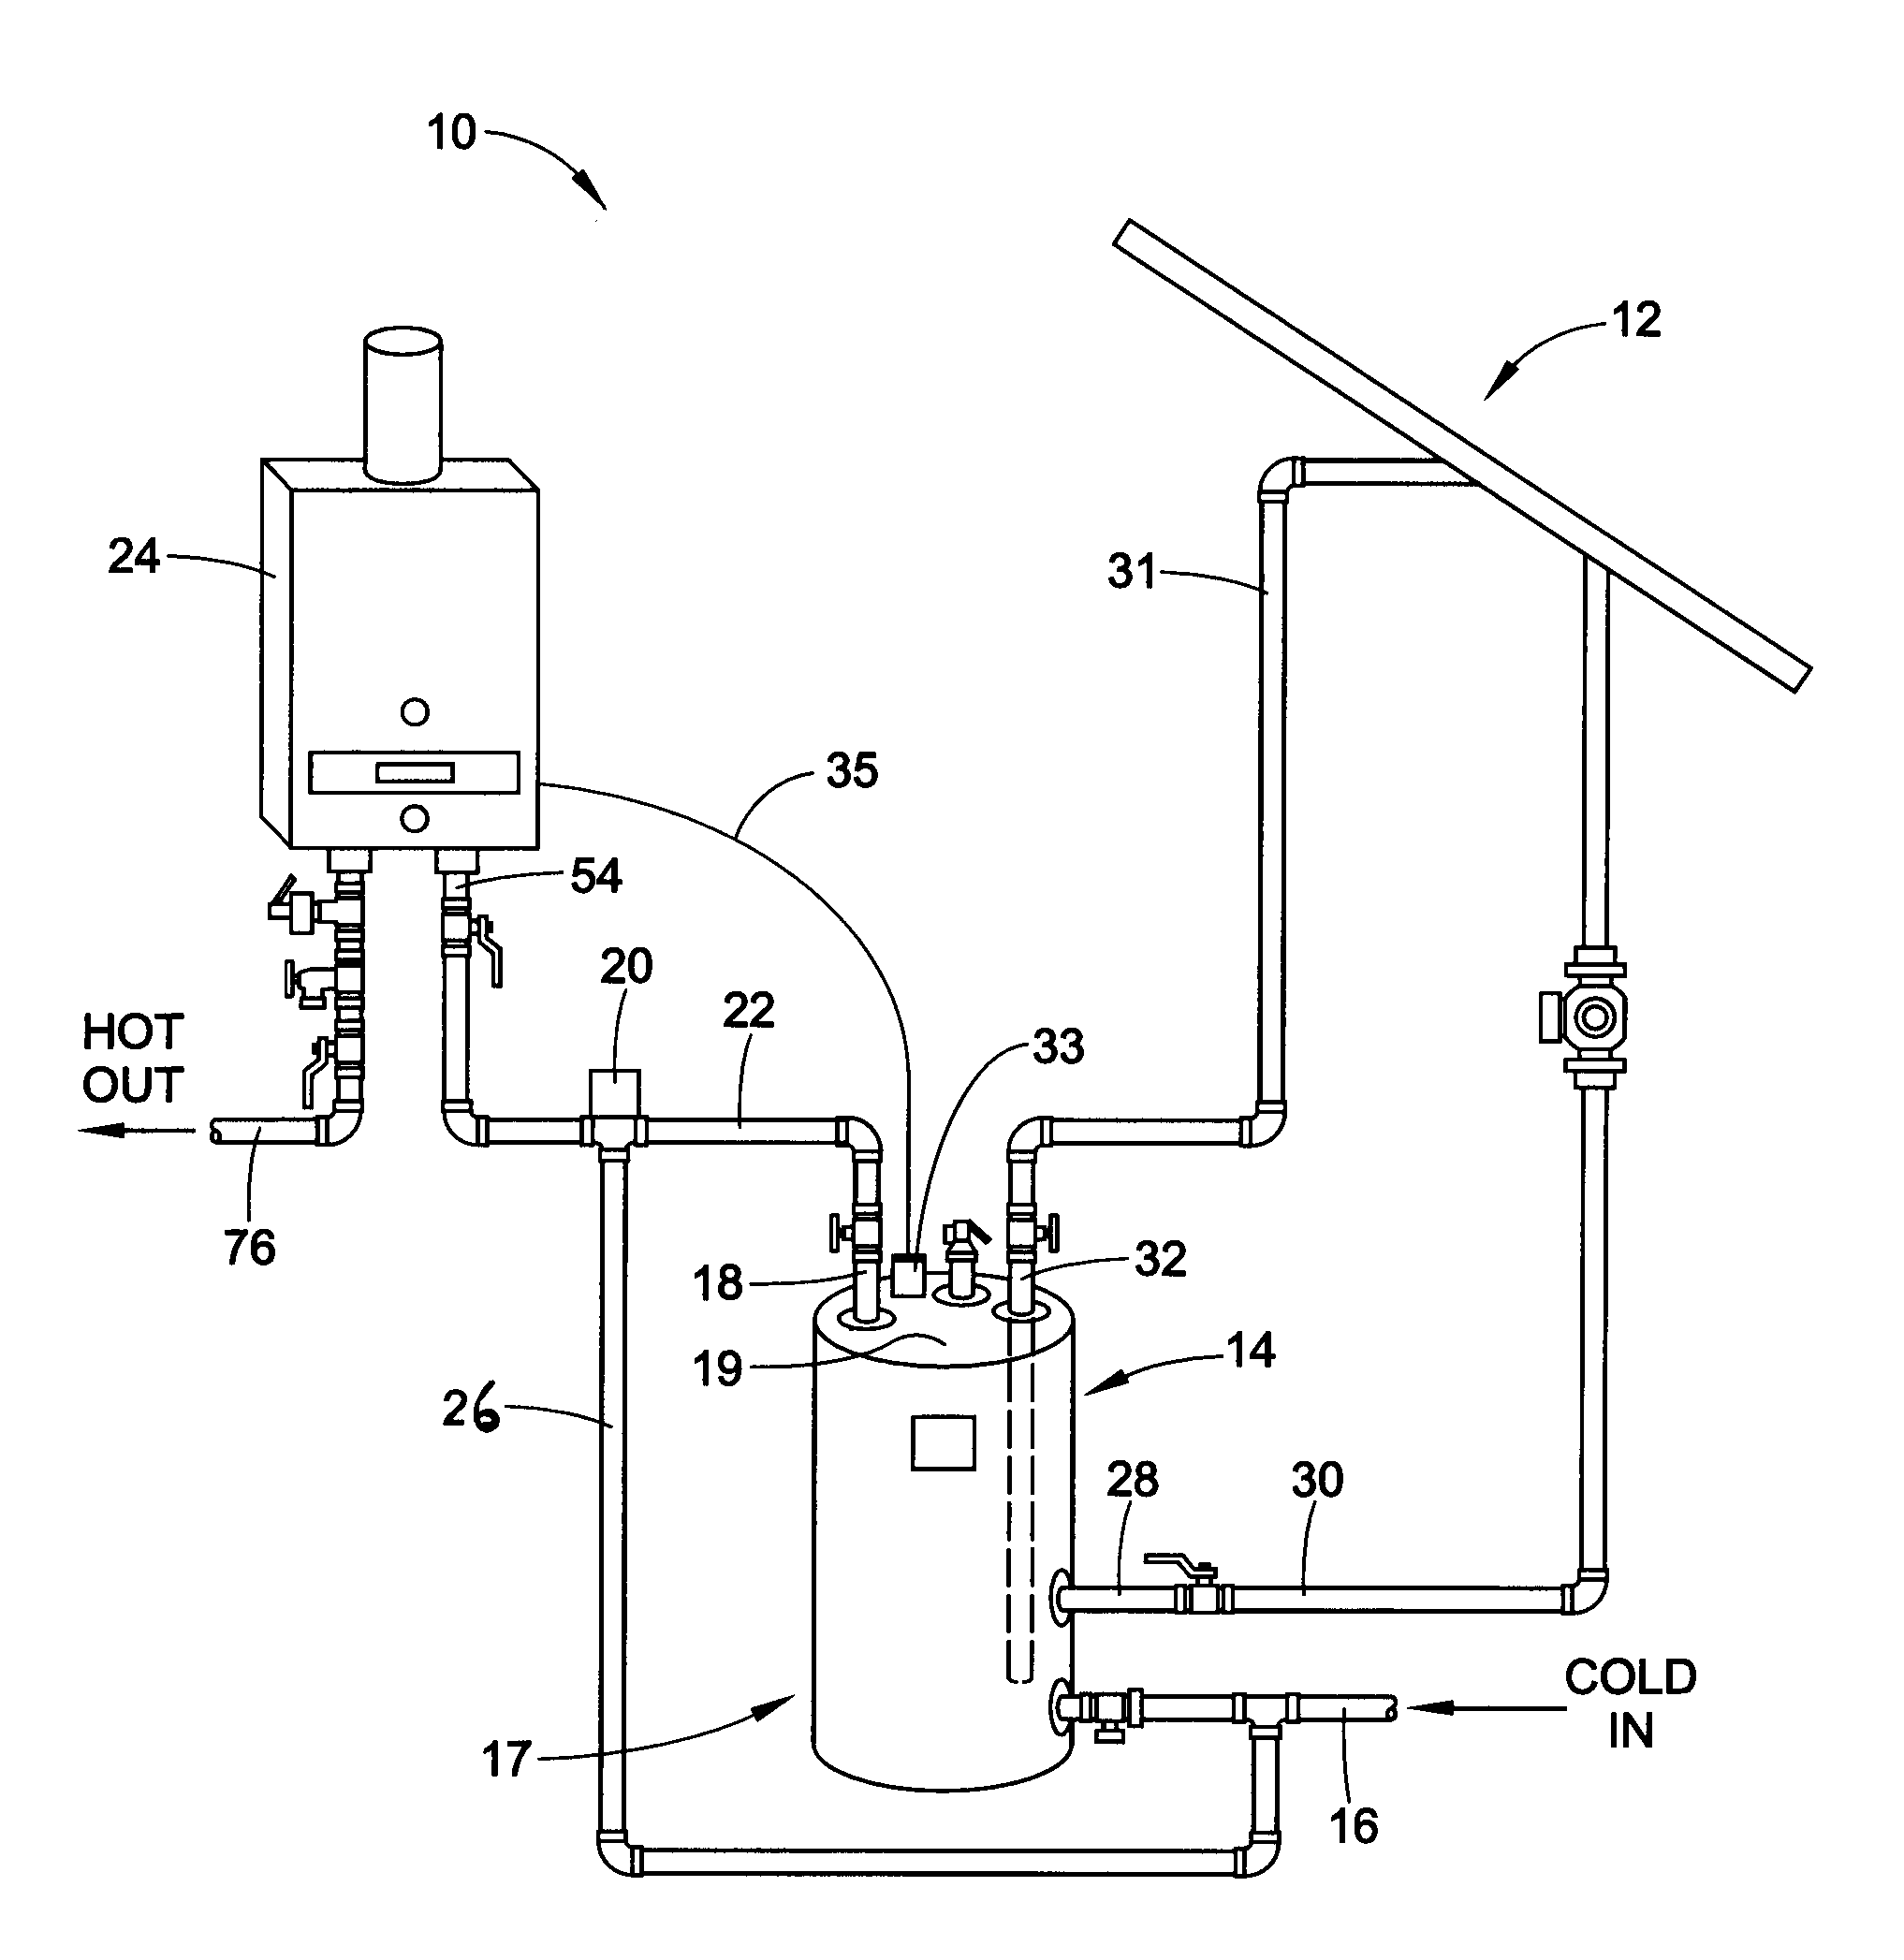 solar water heating system diagram